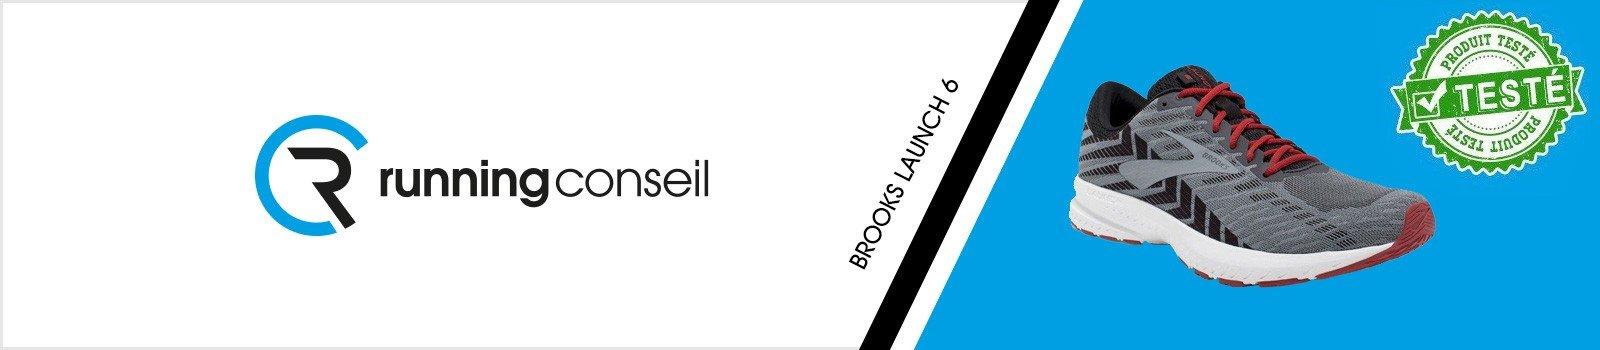 Test Brooks Launch 6 - Running Conseil